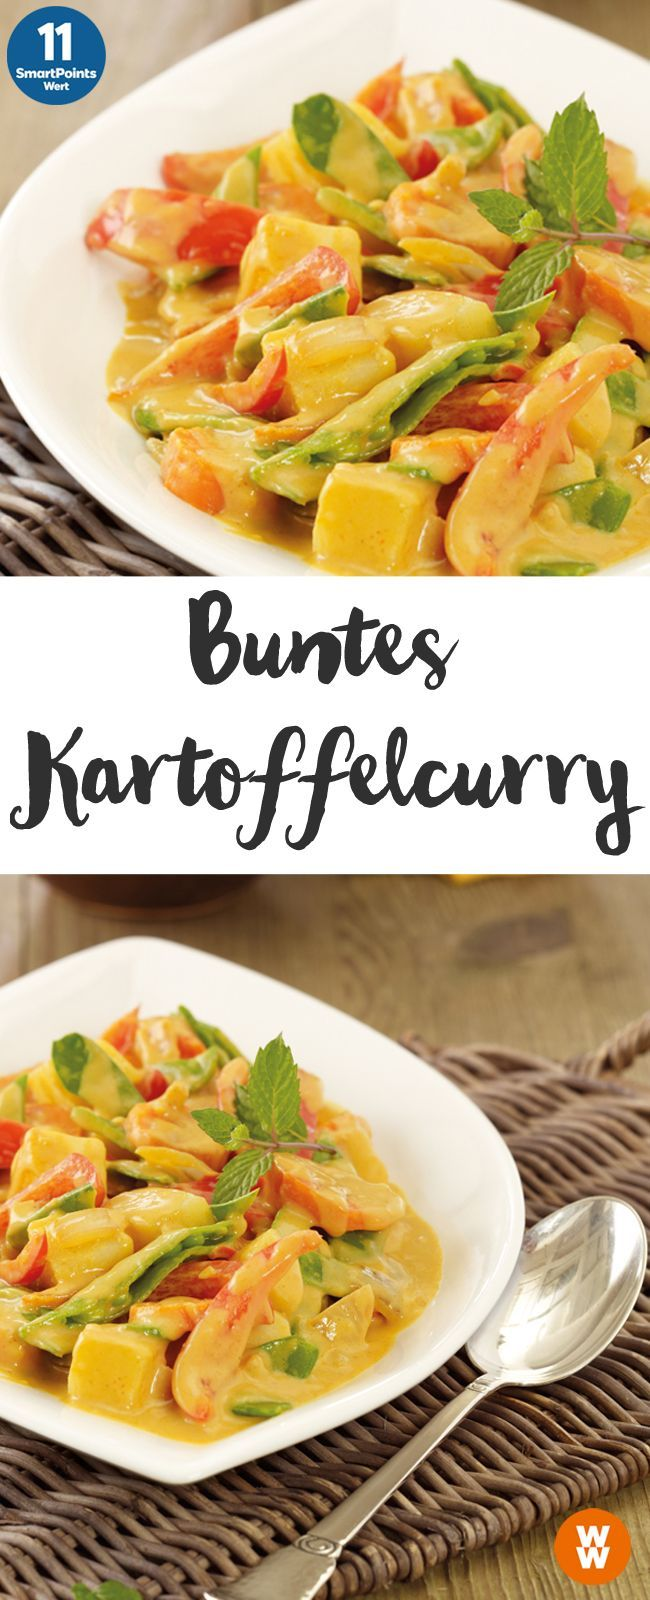 Buntes Kartoffelcurry | http://www.lavita.de